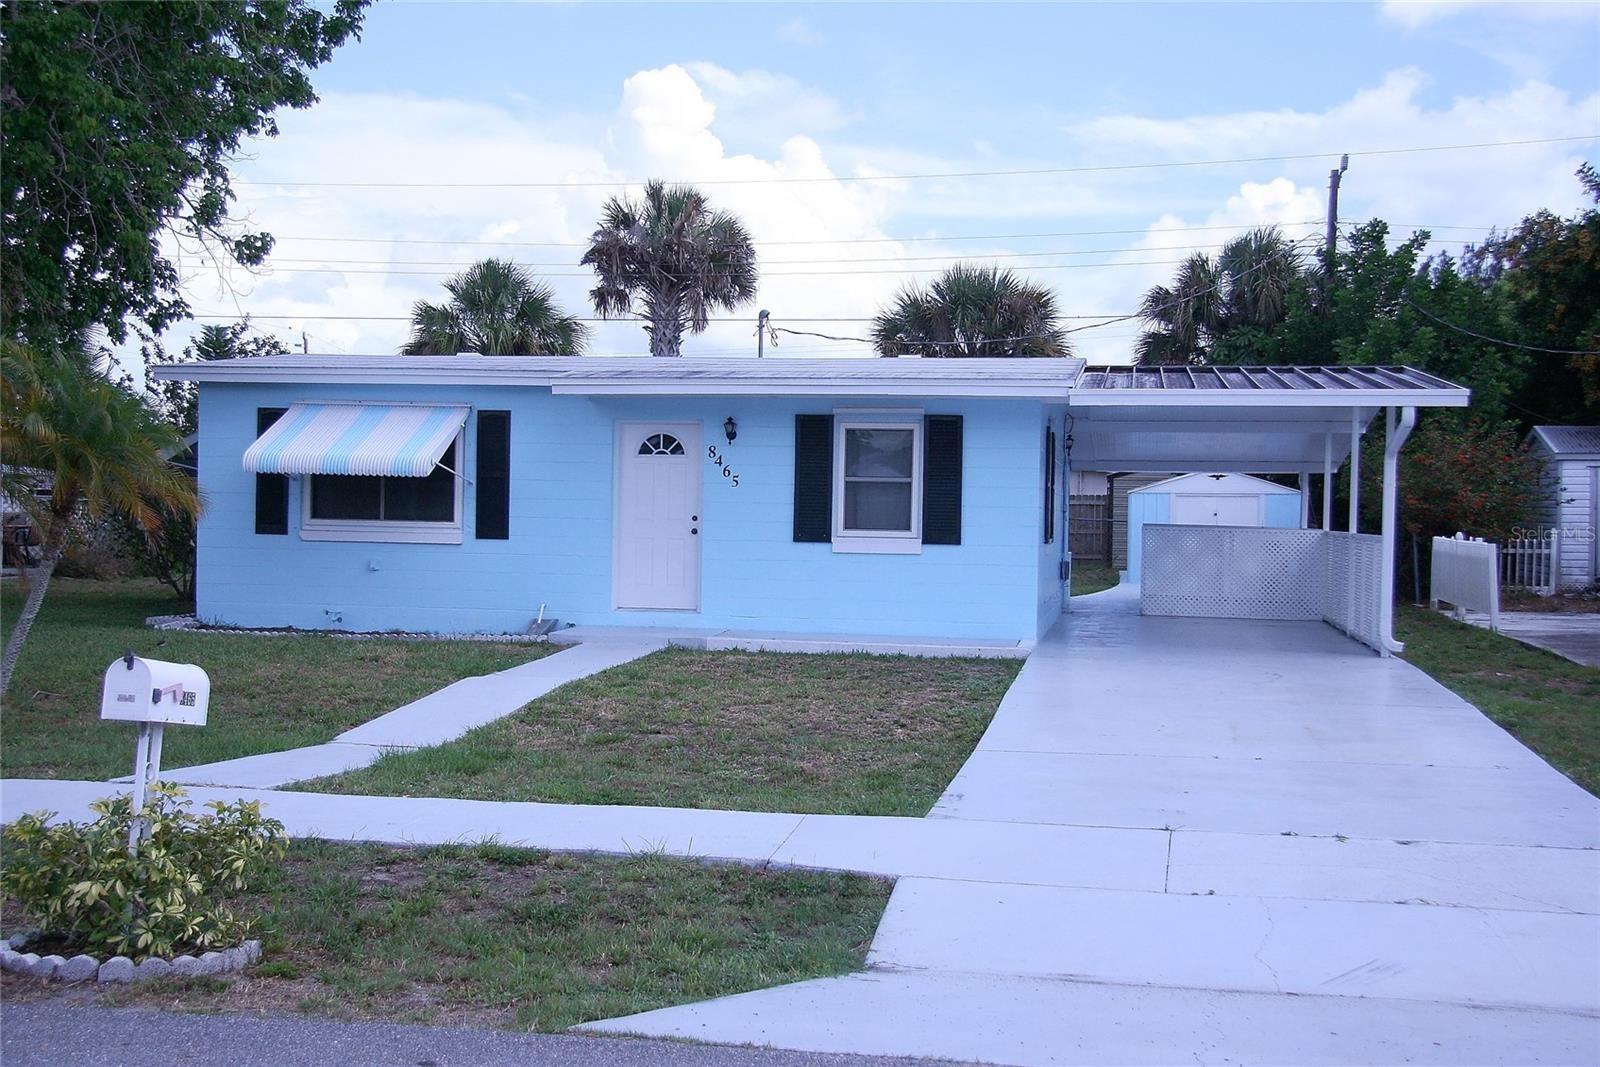 Photo of 8465 BUMFORD AVENUE, NORTH PORT, FL 34287 (MLS # N6115869)